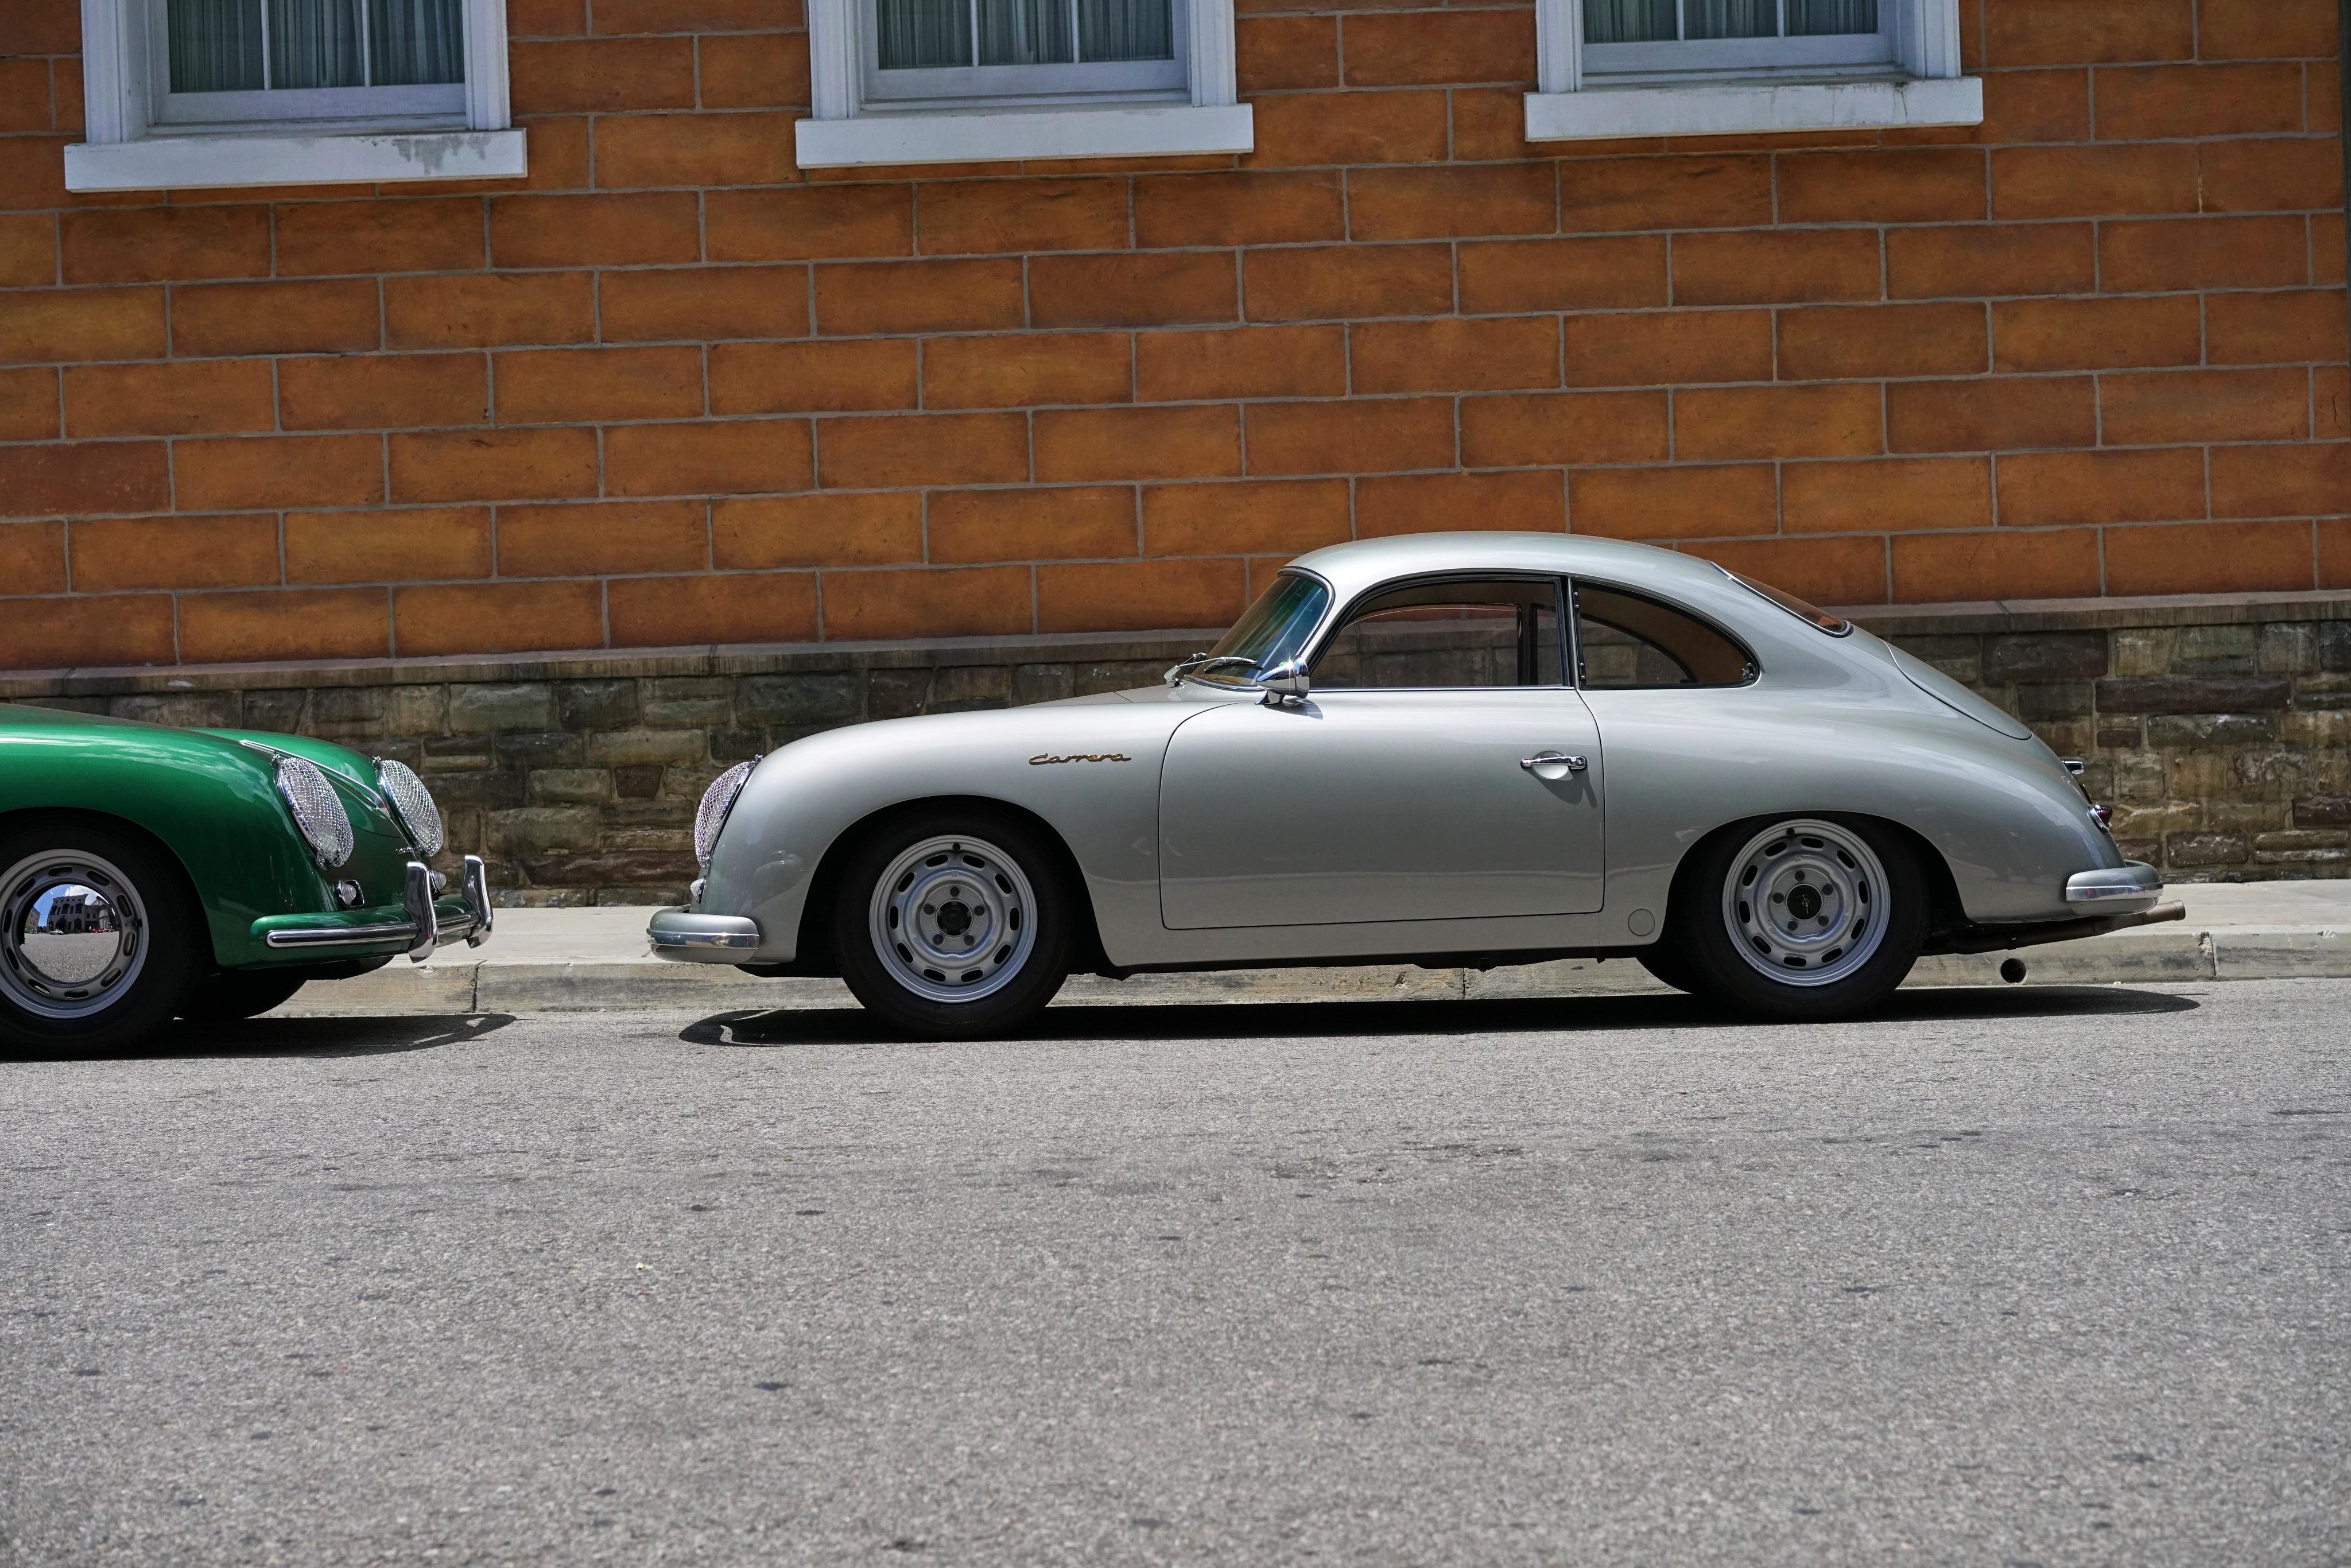 Luftgekühlt-6-Rennen-52-Porsche-356-1956-Carrera-Profile